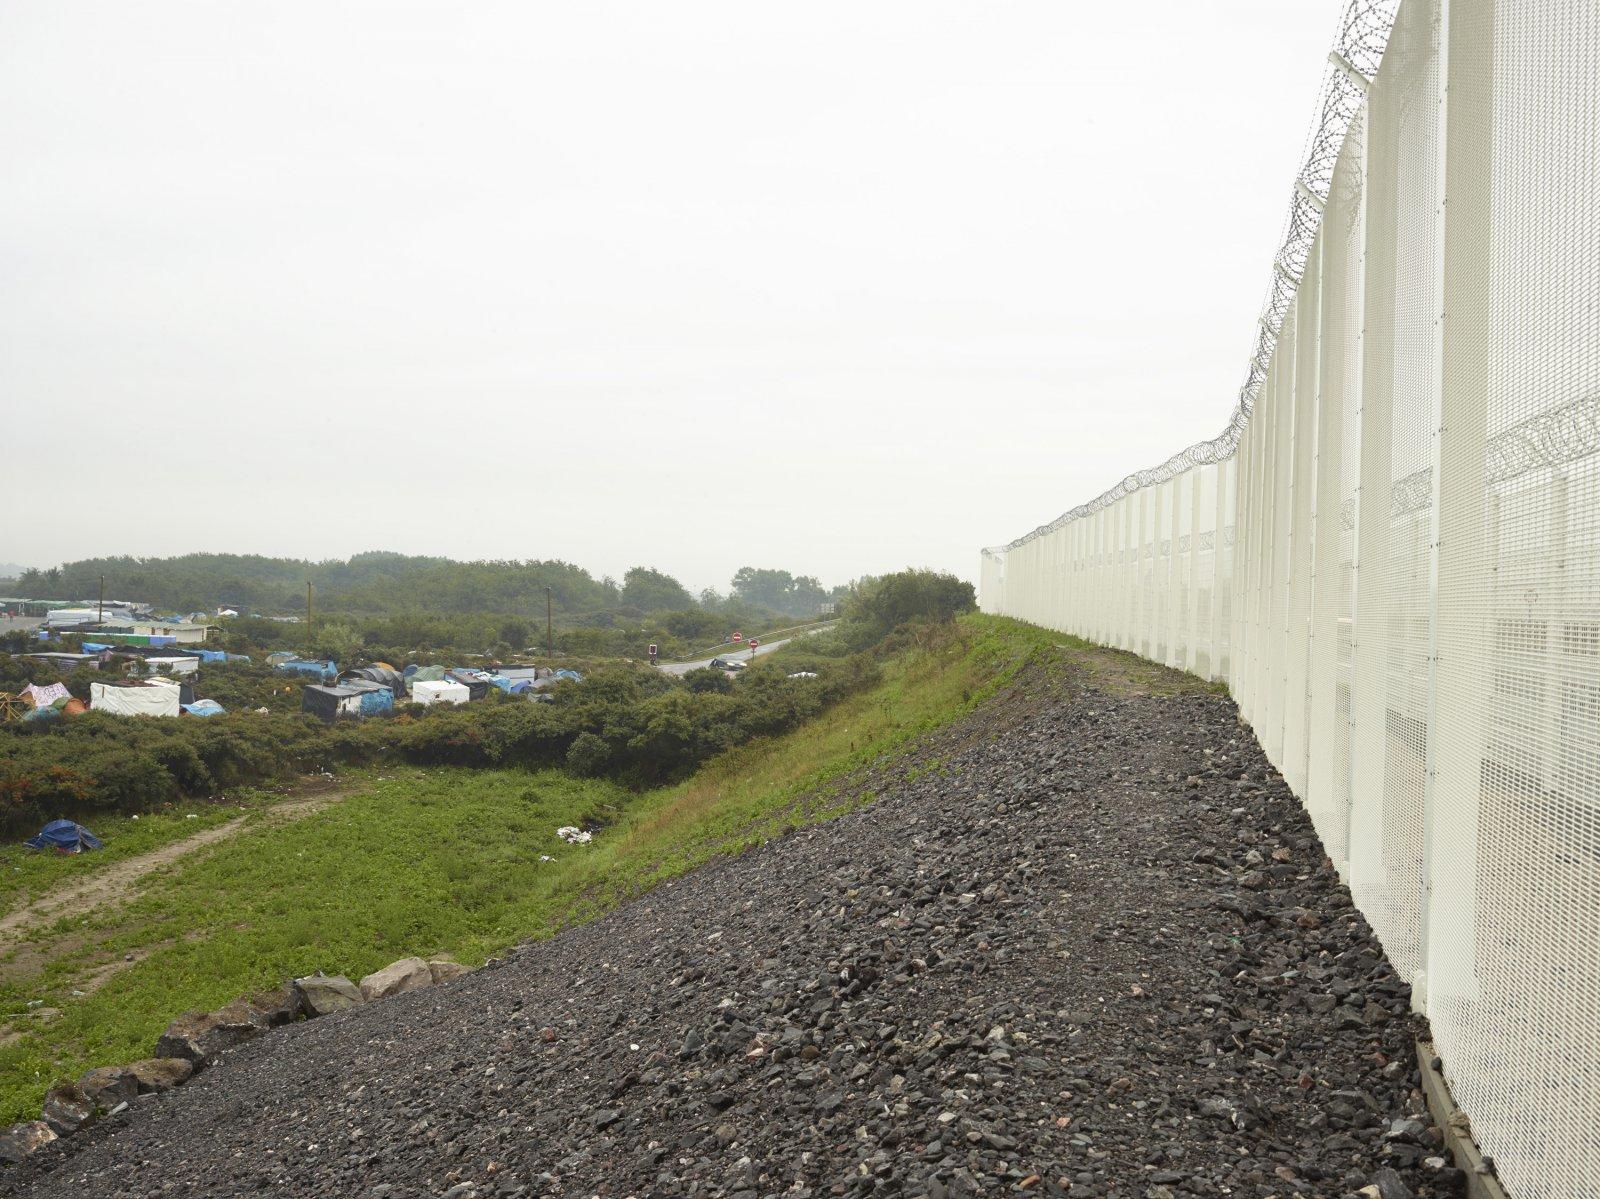 Calais, Aug 2015 © Henk Wildschut